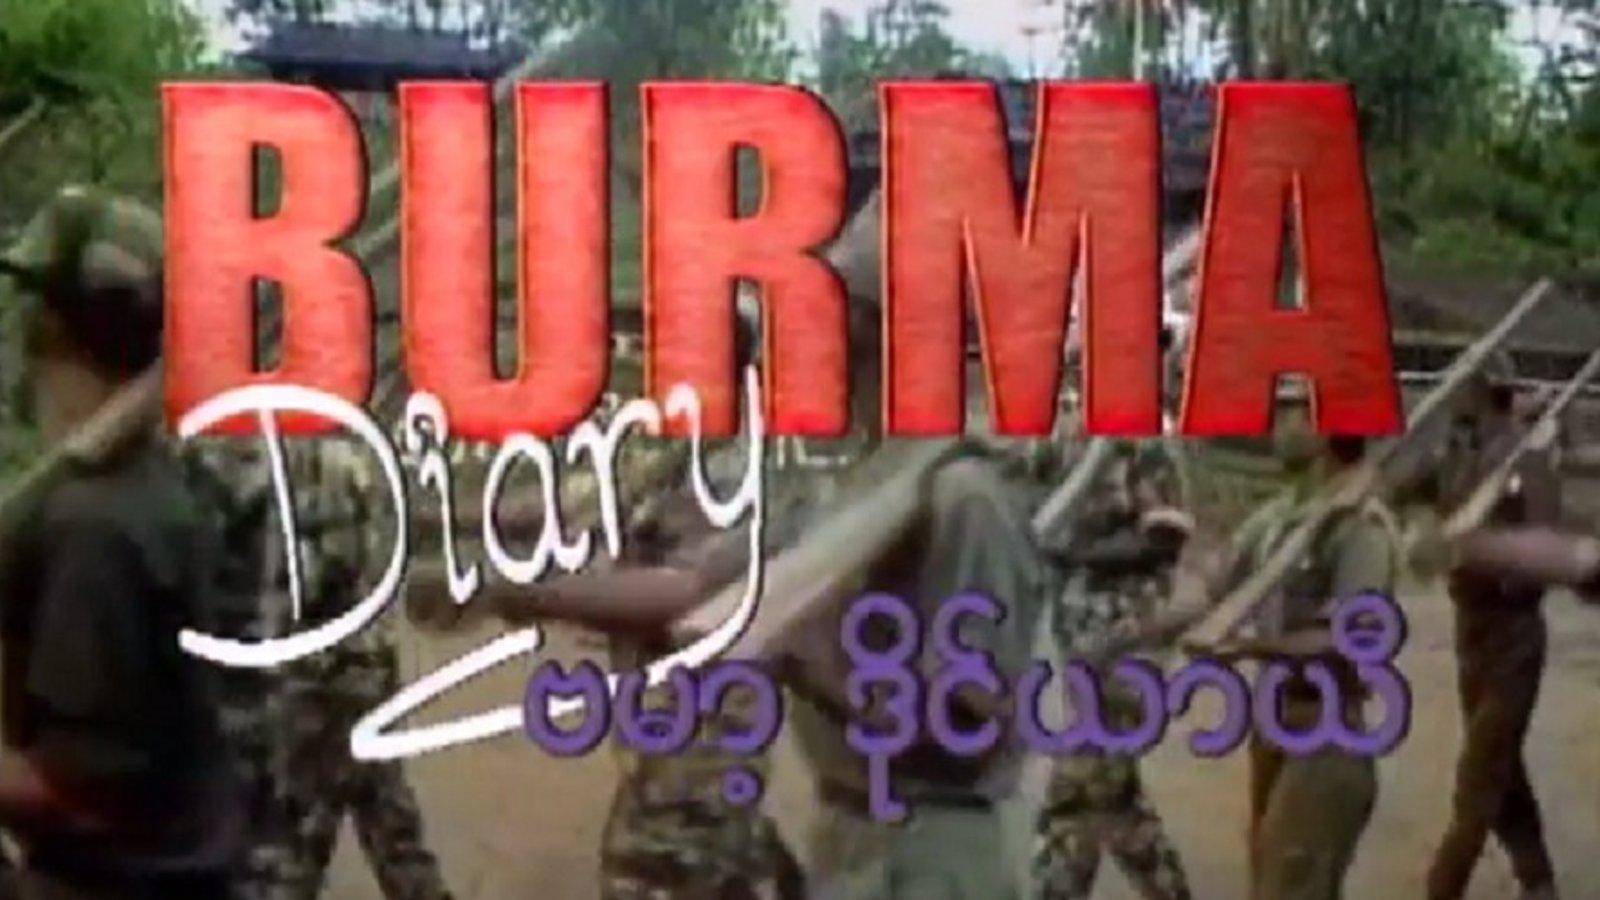 Burma Diary